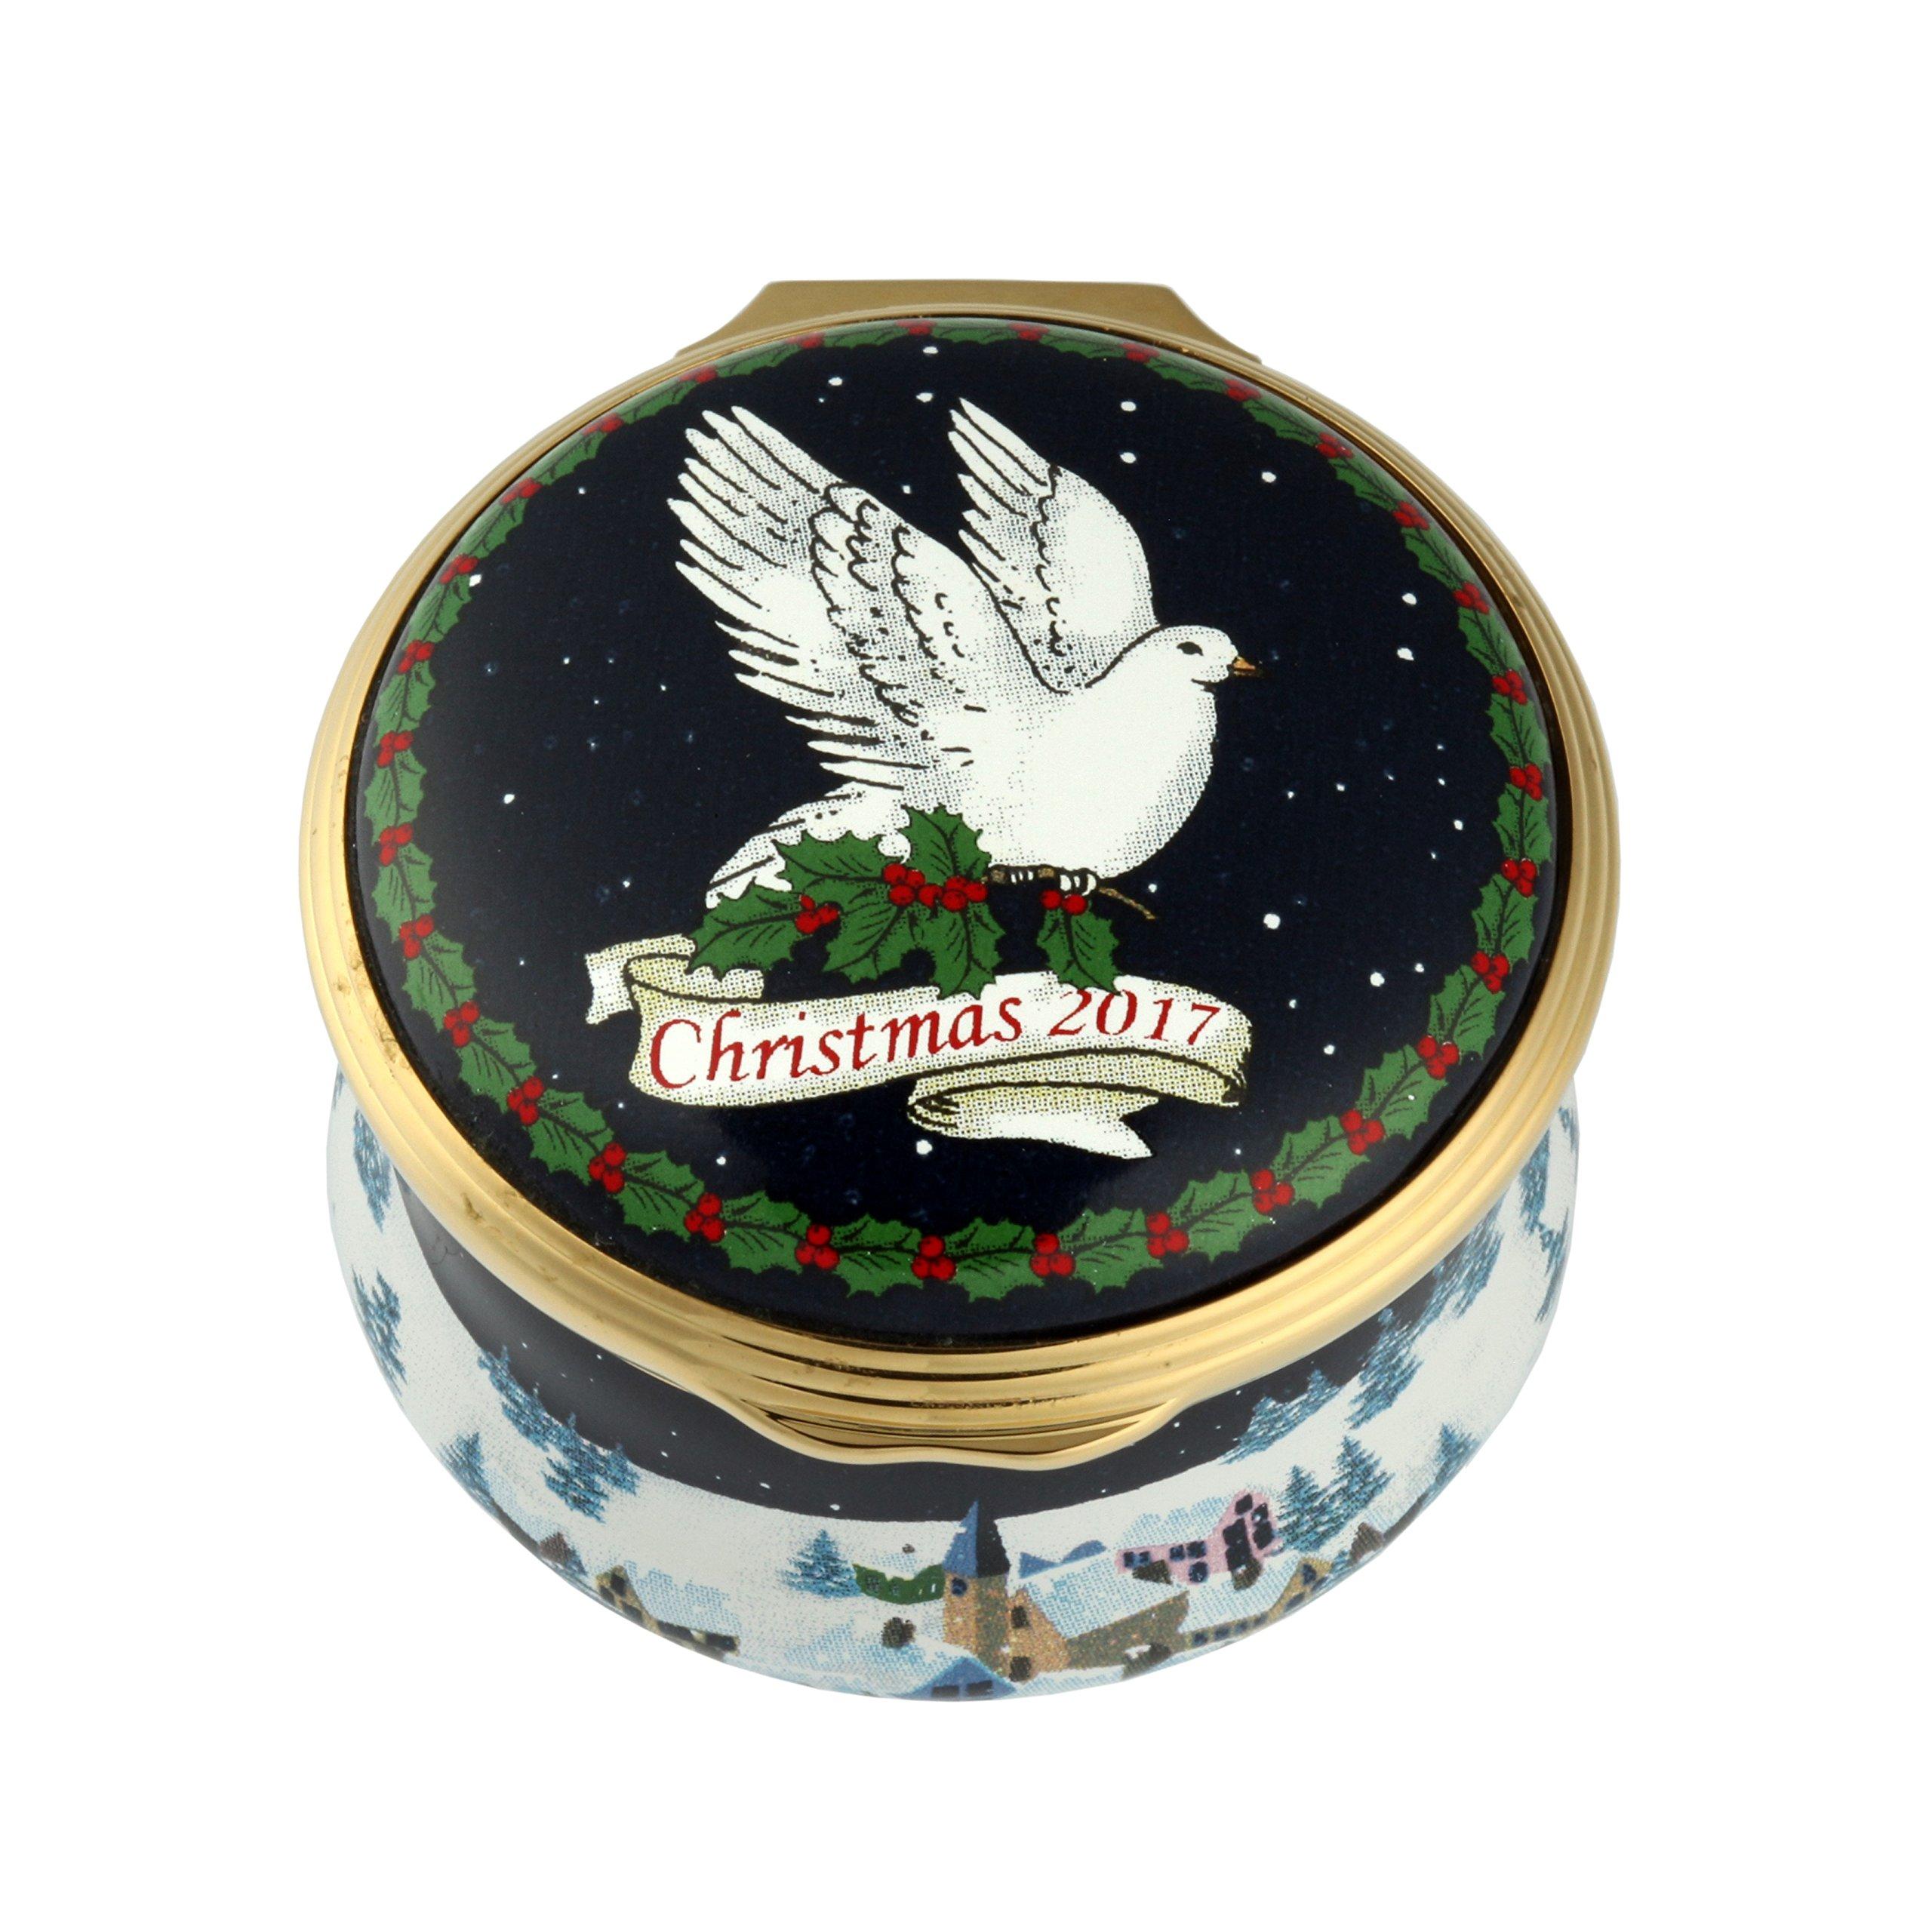 Halcyon Days, Christmas 2017 Dove of Peace Enamel Box w/Inside Inscription, 24K Gold Fittings, Gift Box by Halcyon Days (Image #2)